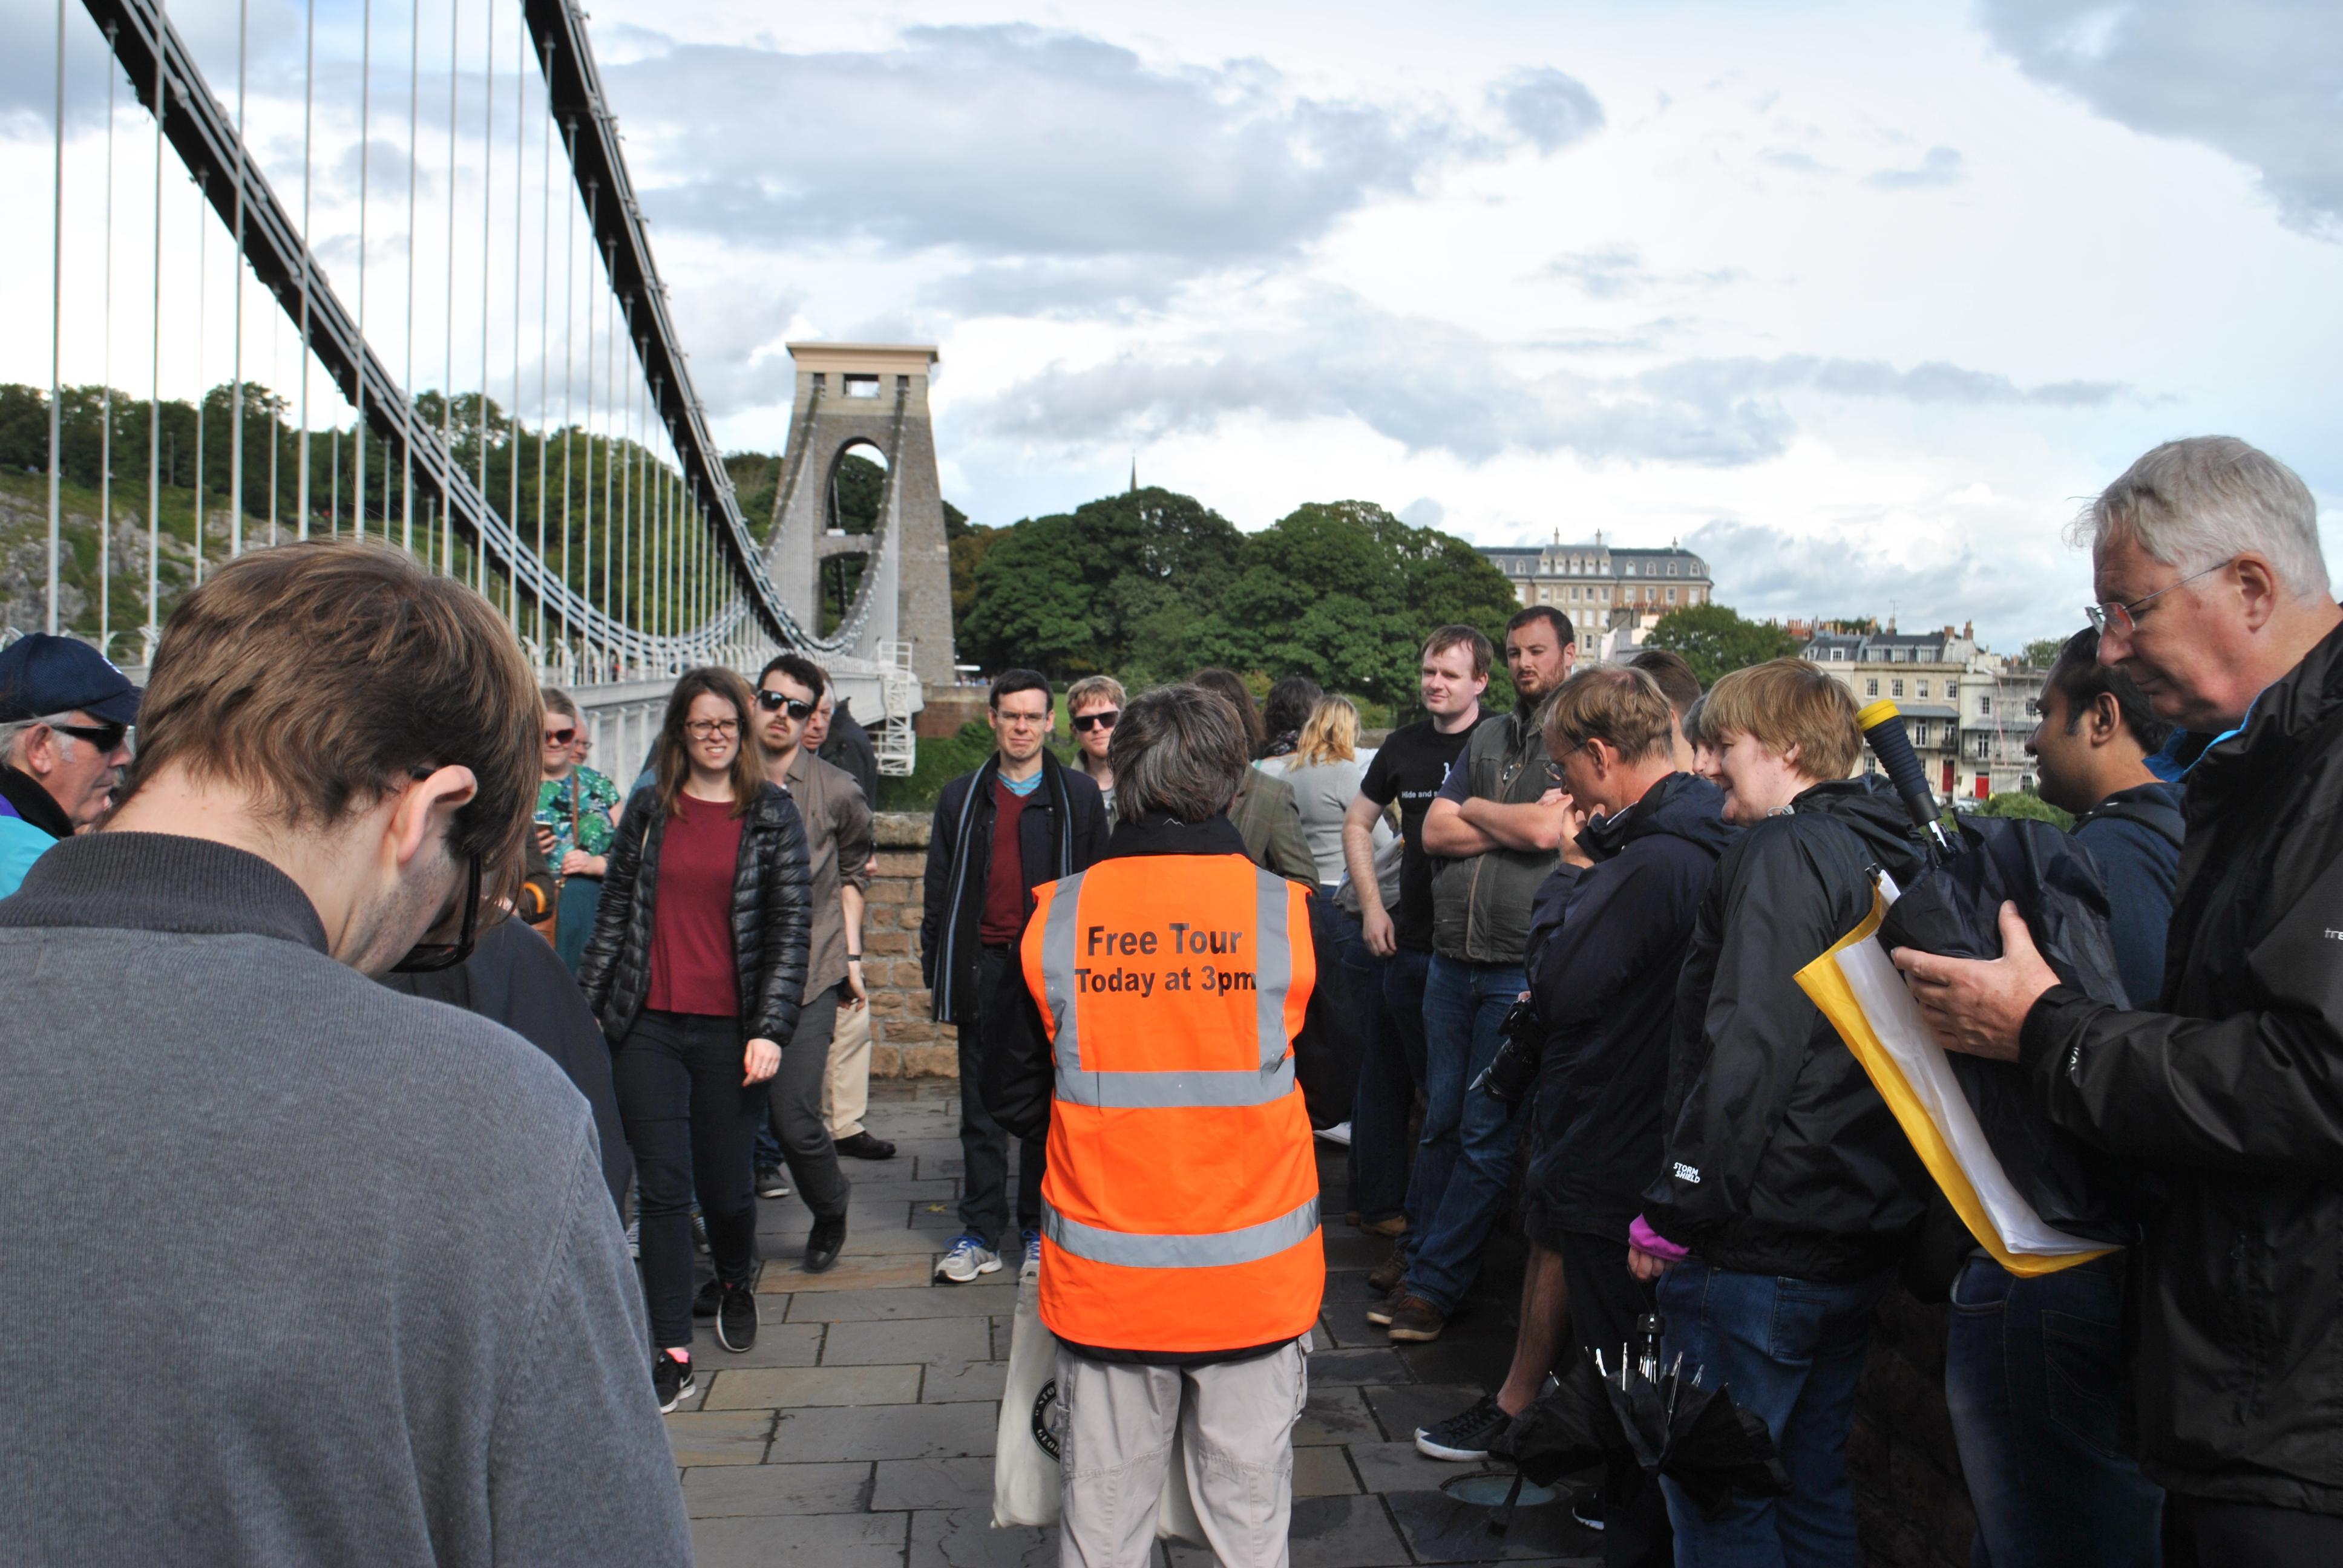 Free Bridge Tour Summer 2020 - Meet at the Clifton Toll Booth